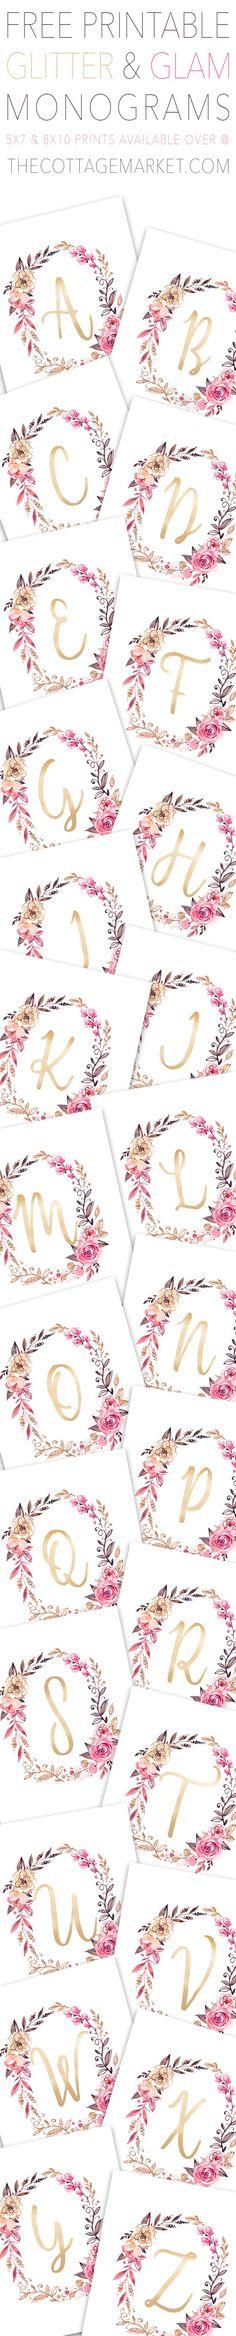 Free Printable Glitter and Glam Monograms | The Cottage Market | Bloglovin'